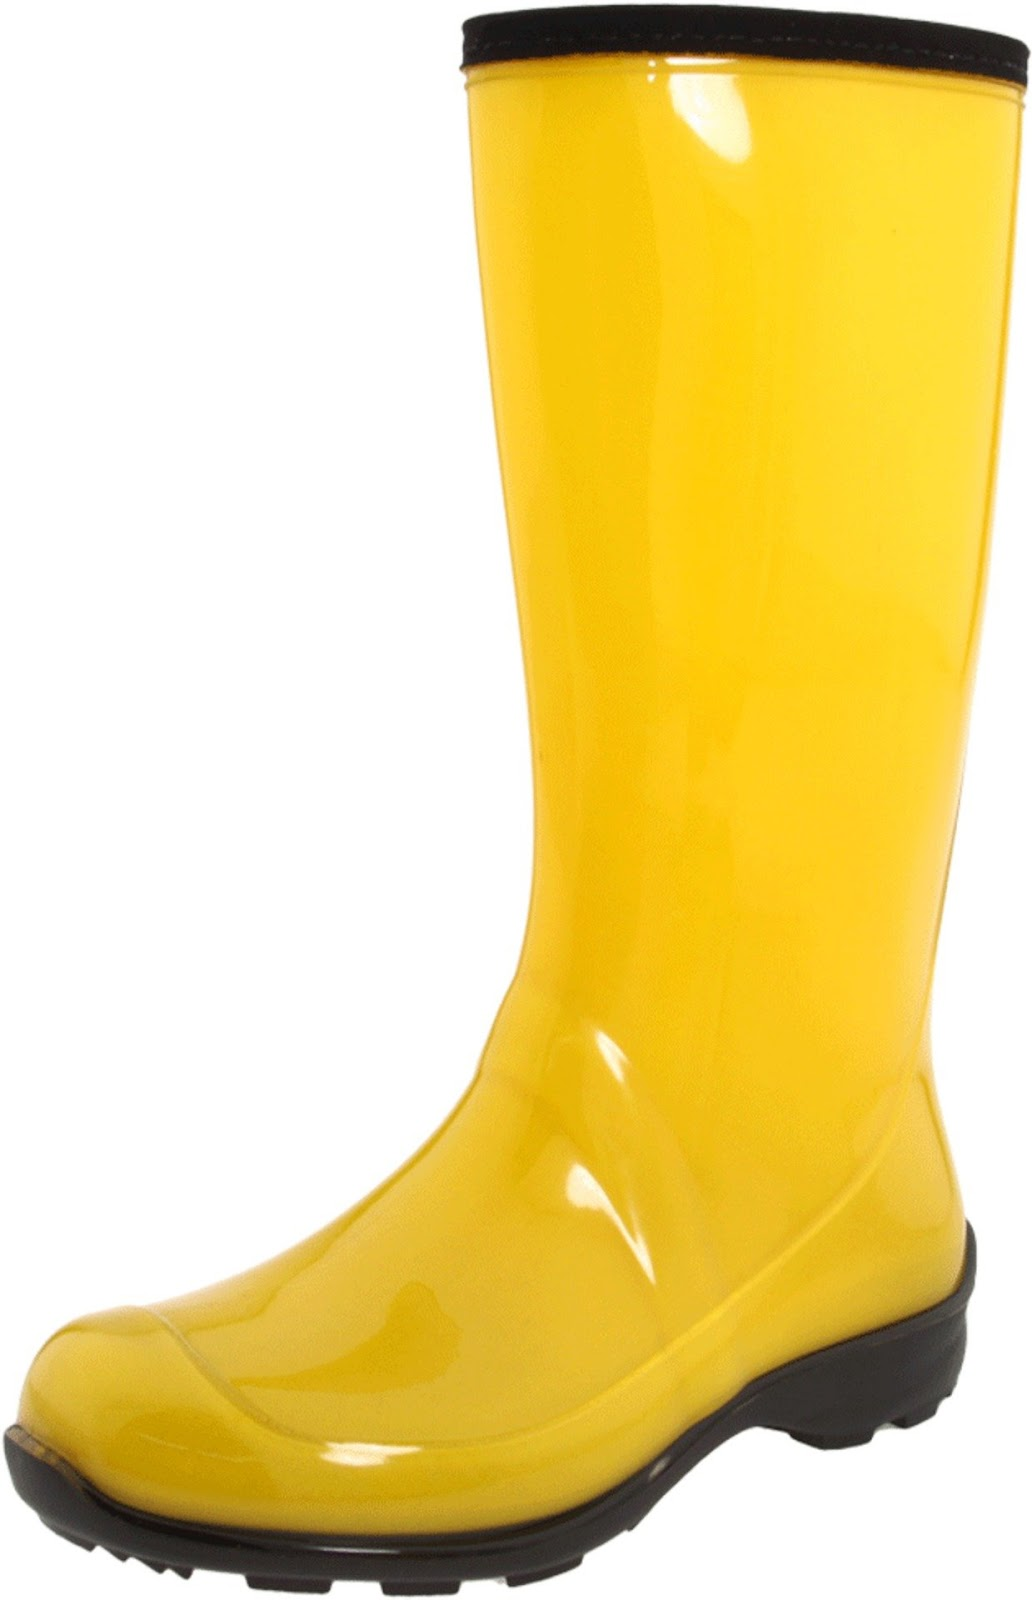 1032x1600 Boots Clipart Rainy